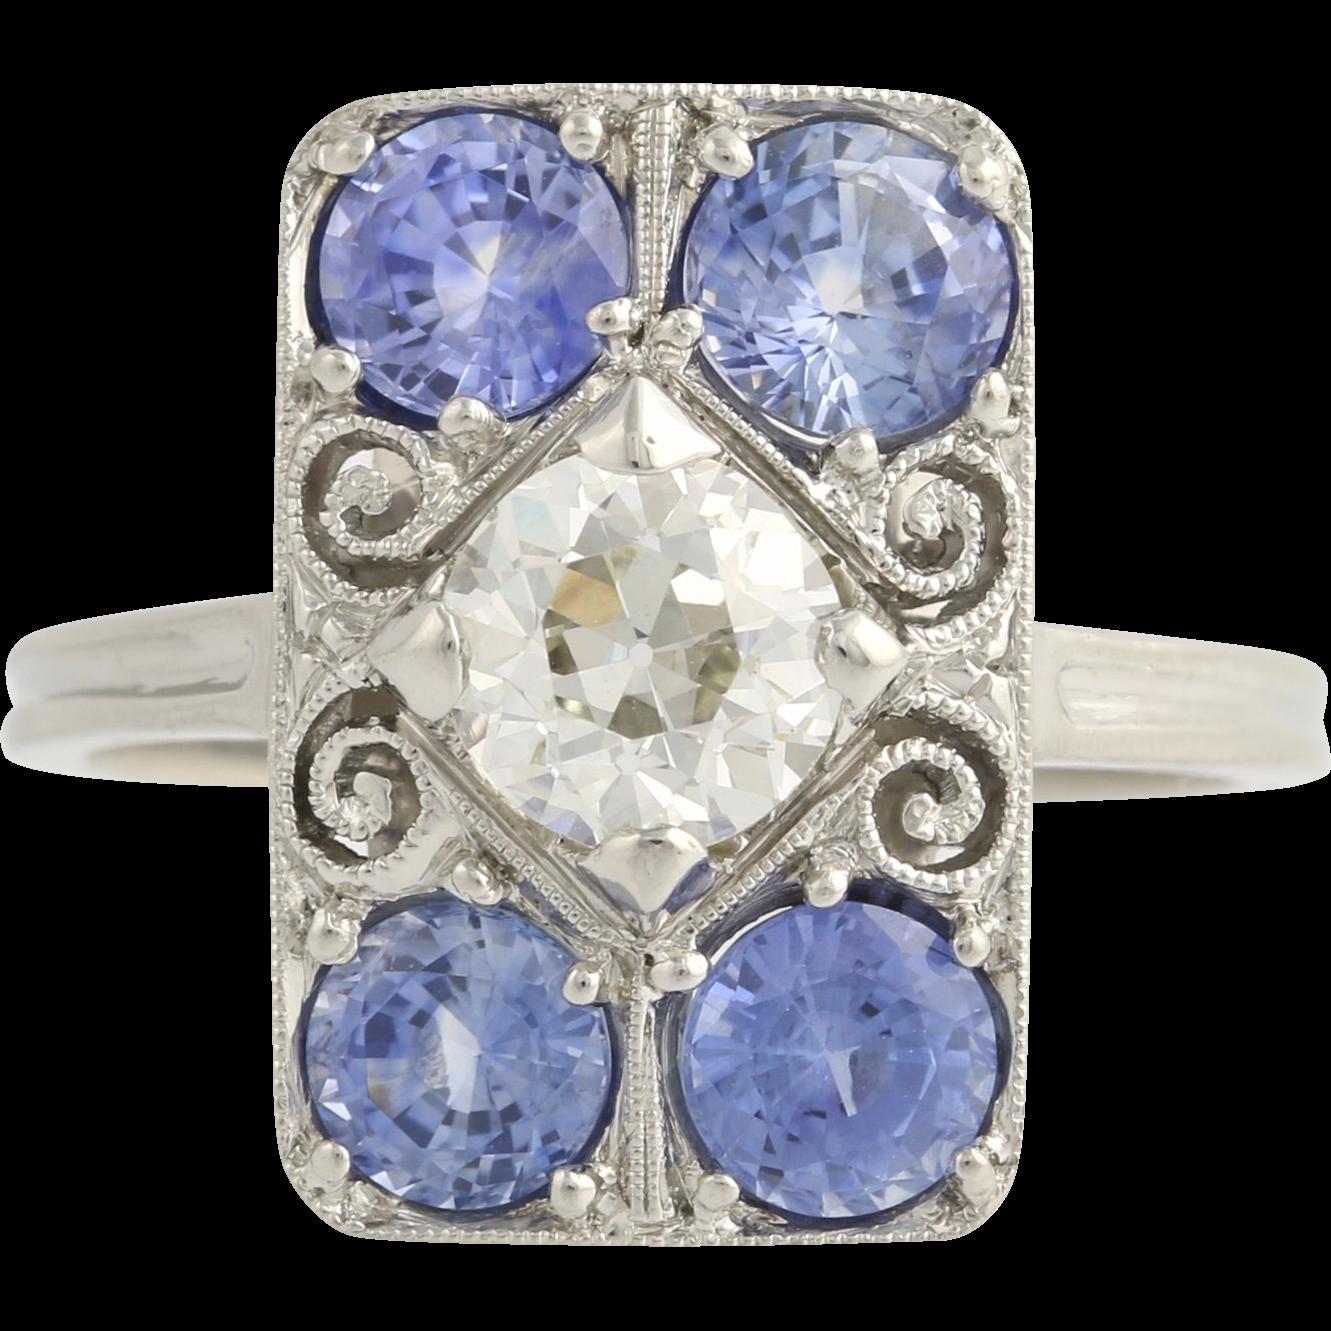 Sapphire & Diamond Cocktail Ring - Platinum Rectangular Women's Genuine 3.29ctw